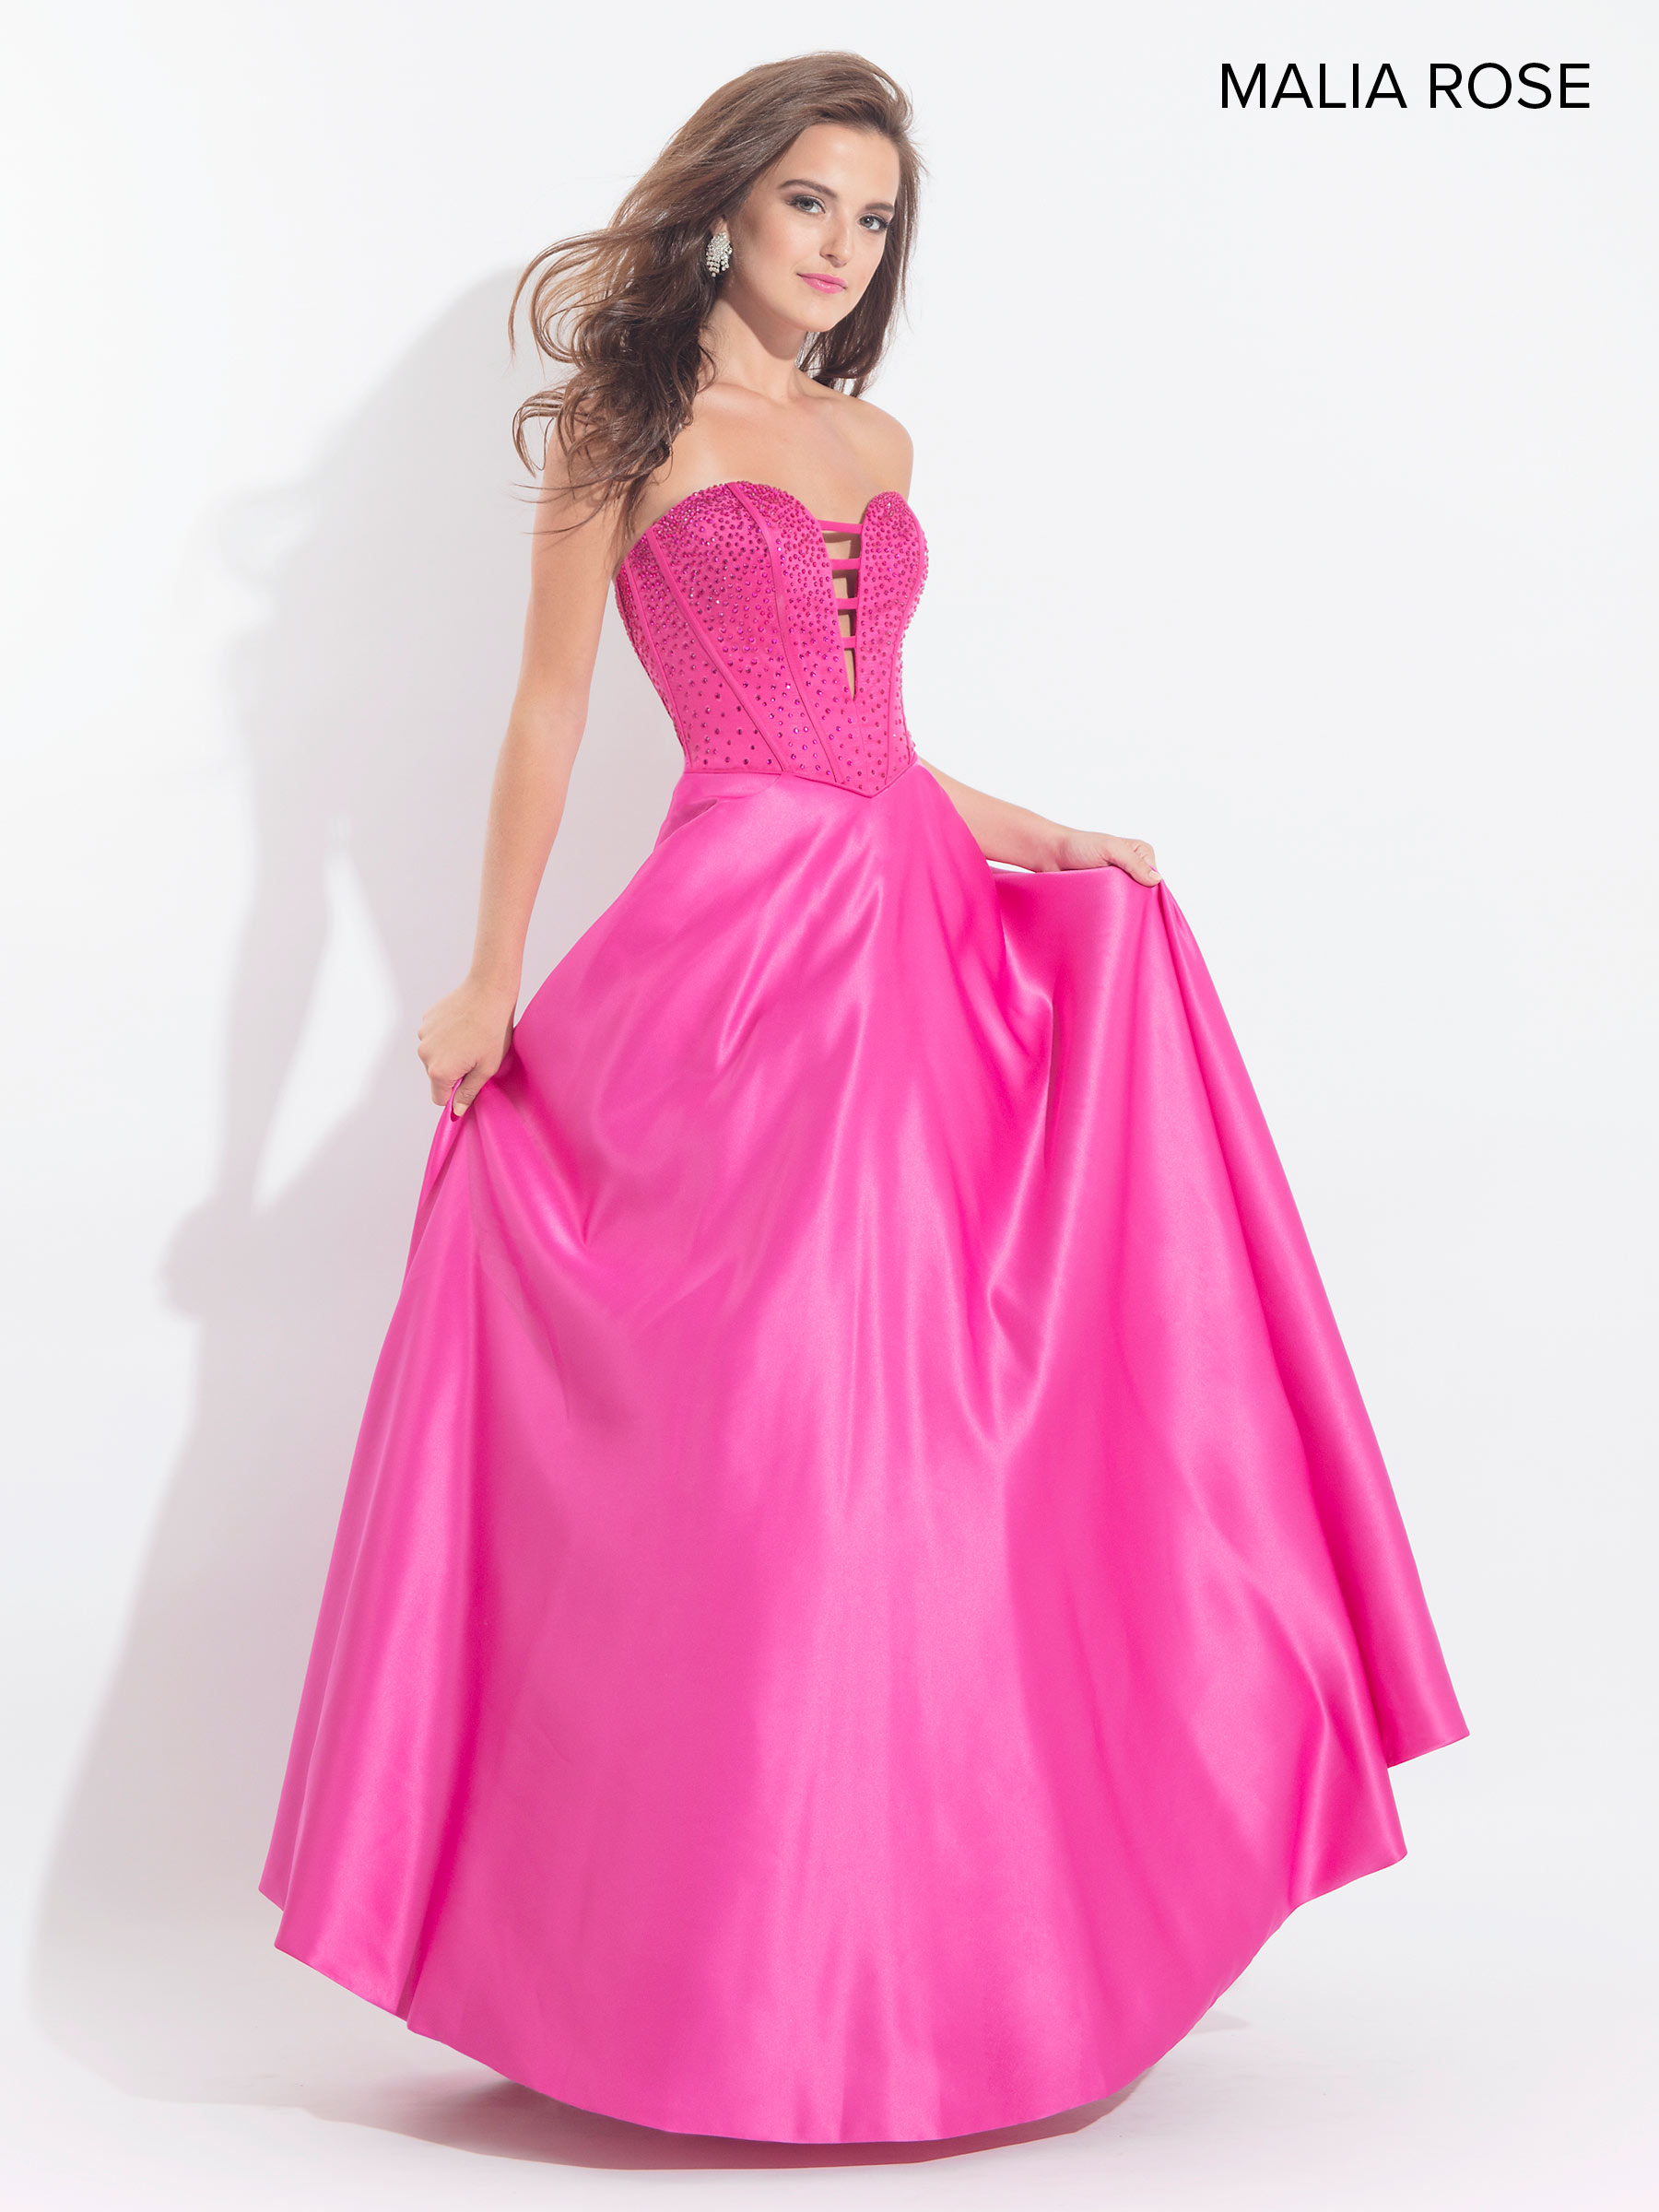 Malia Rose Prom Dresses | Style - MP1009 in Sky Blue or Fuchsia Color